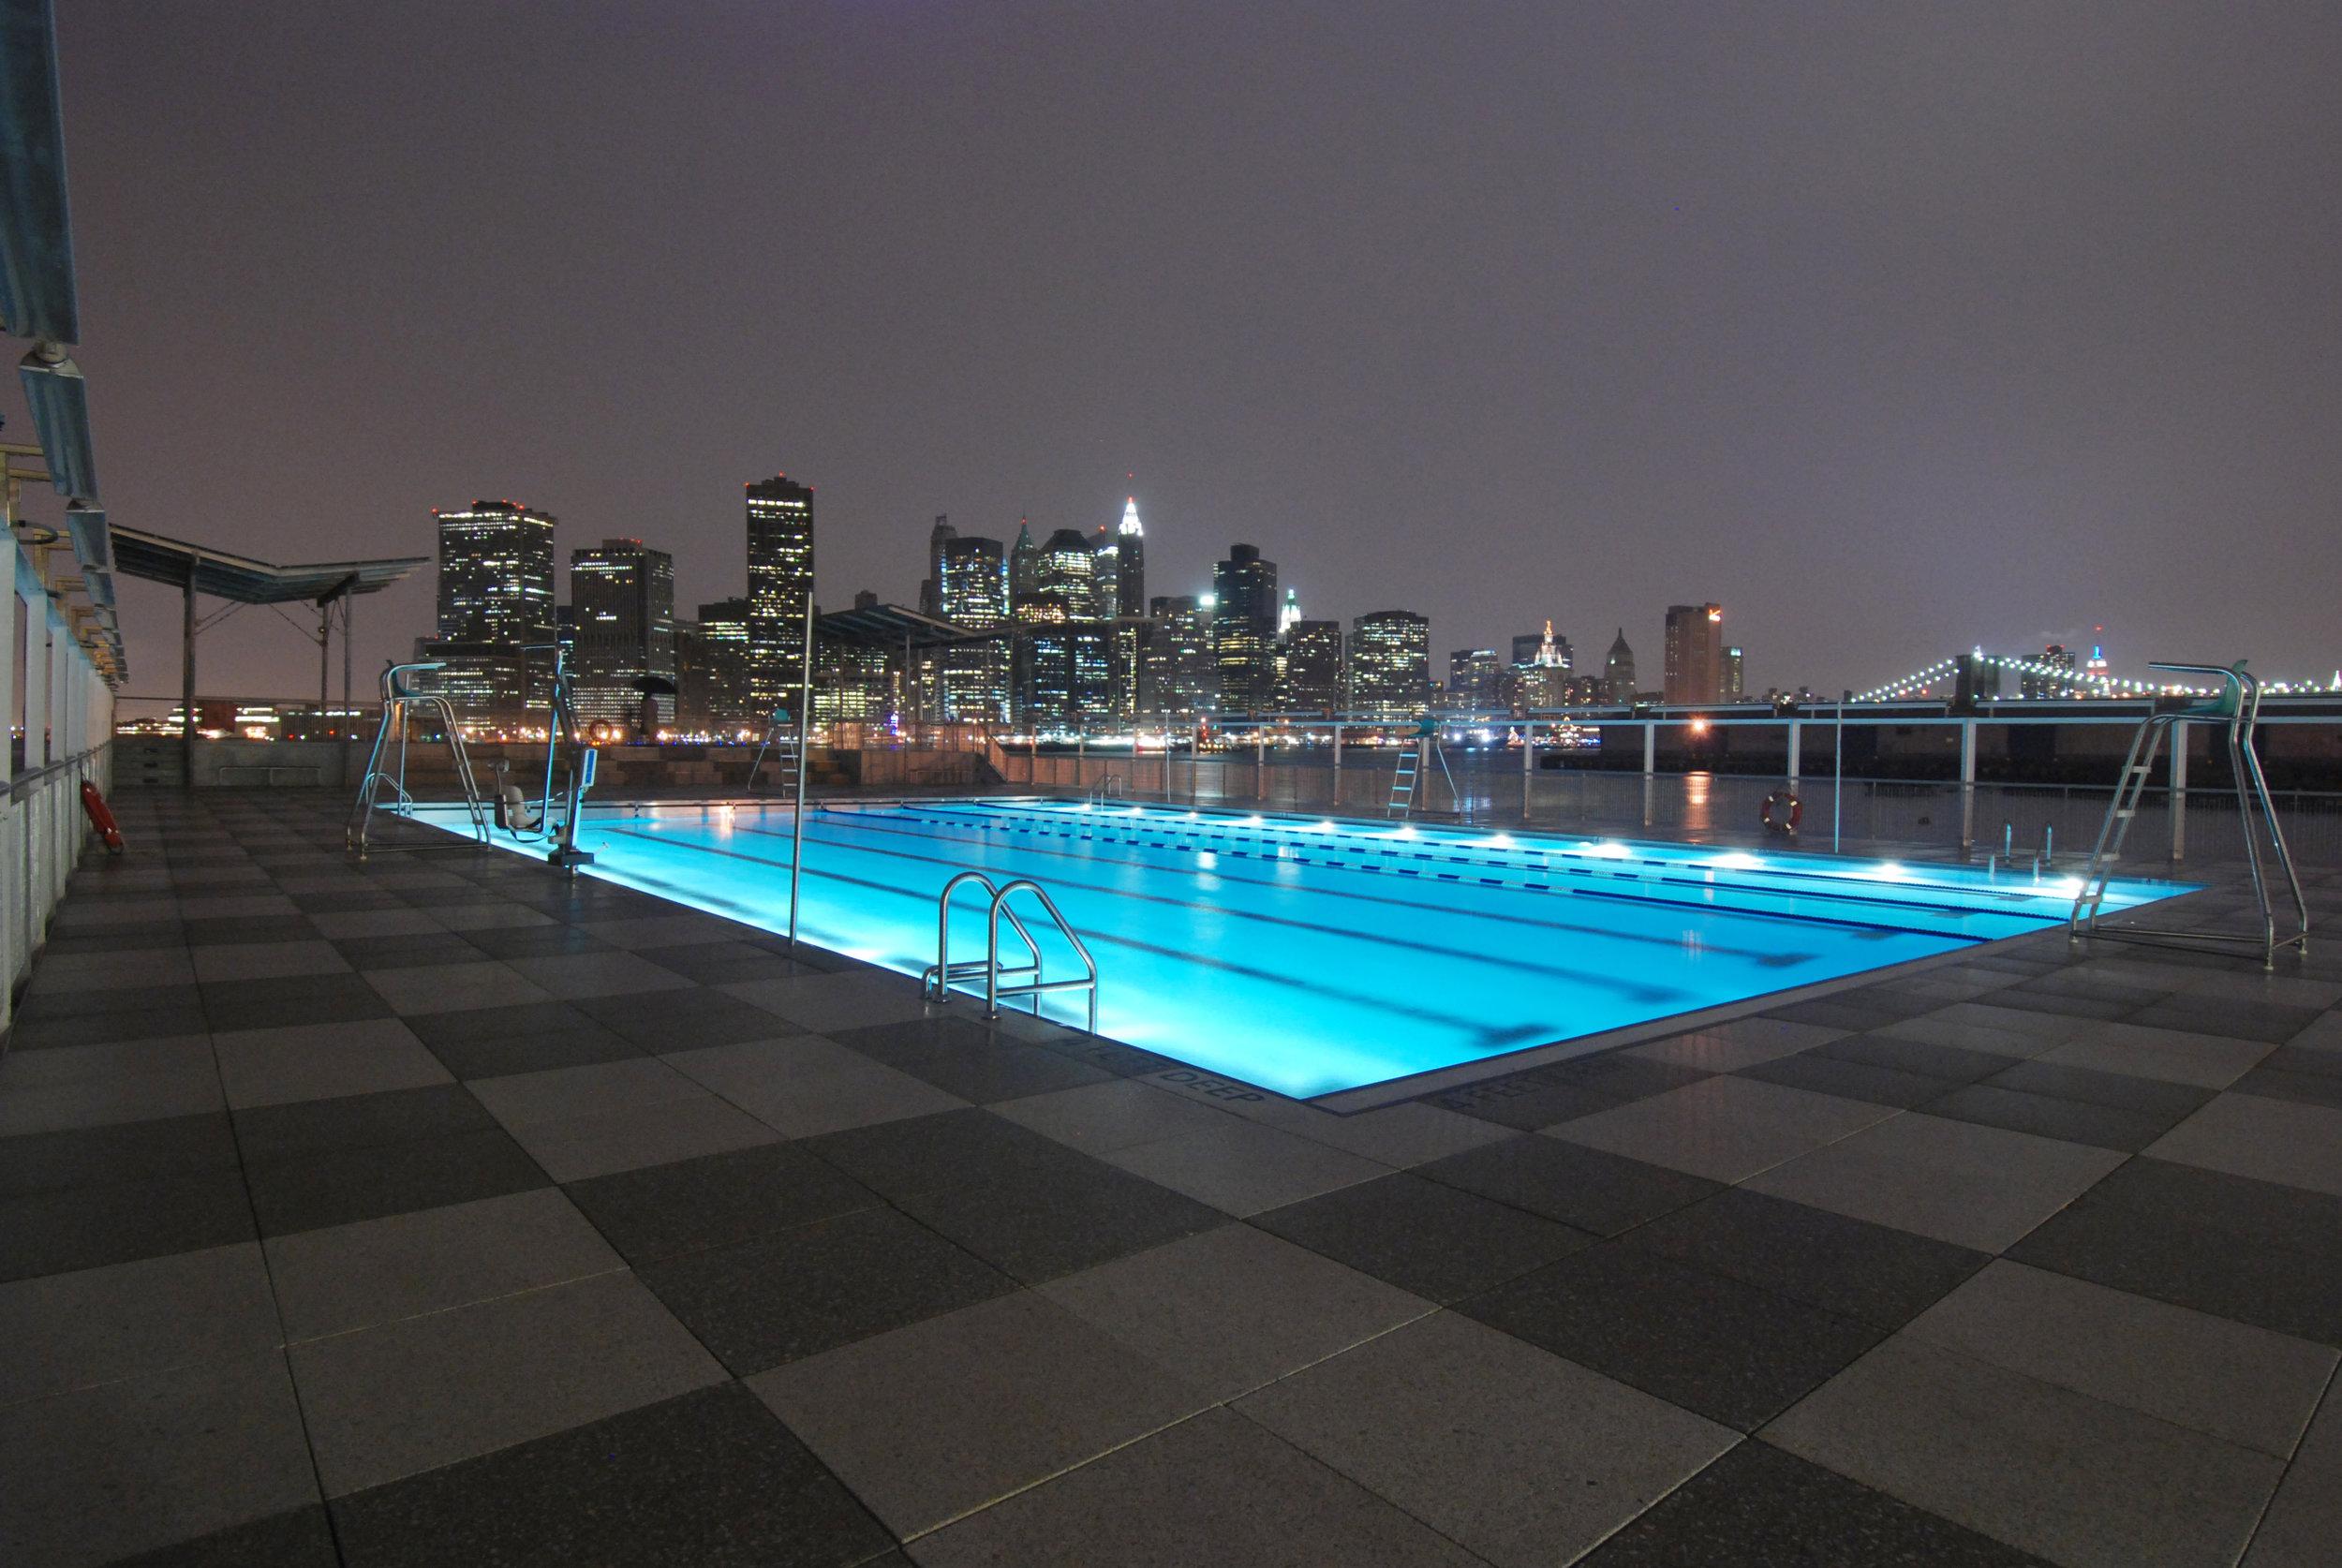 12 Pool Night (Philippe Baumann).jpg